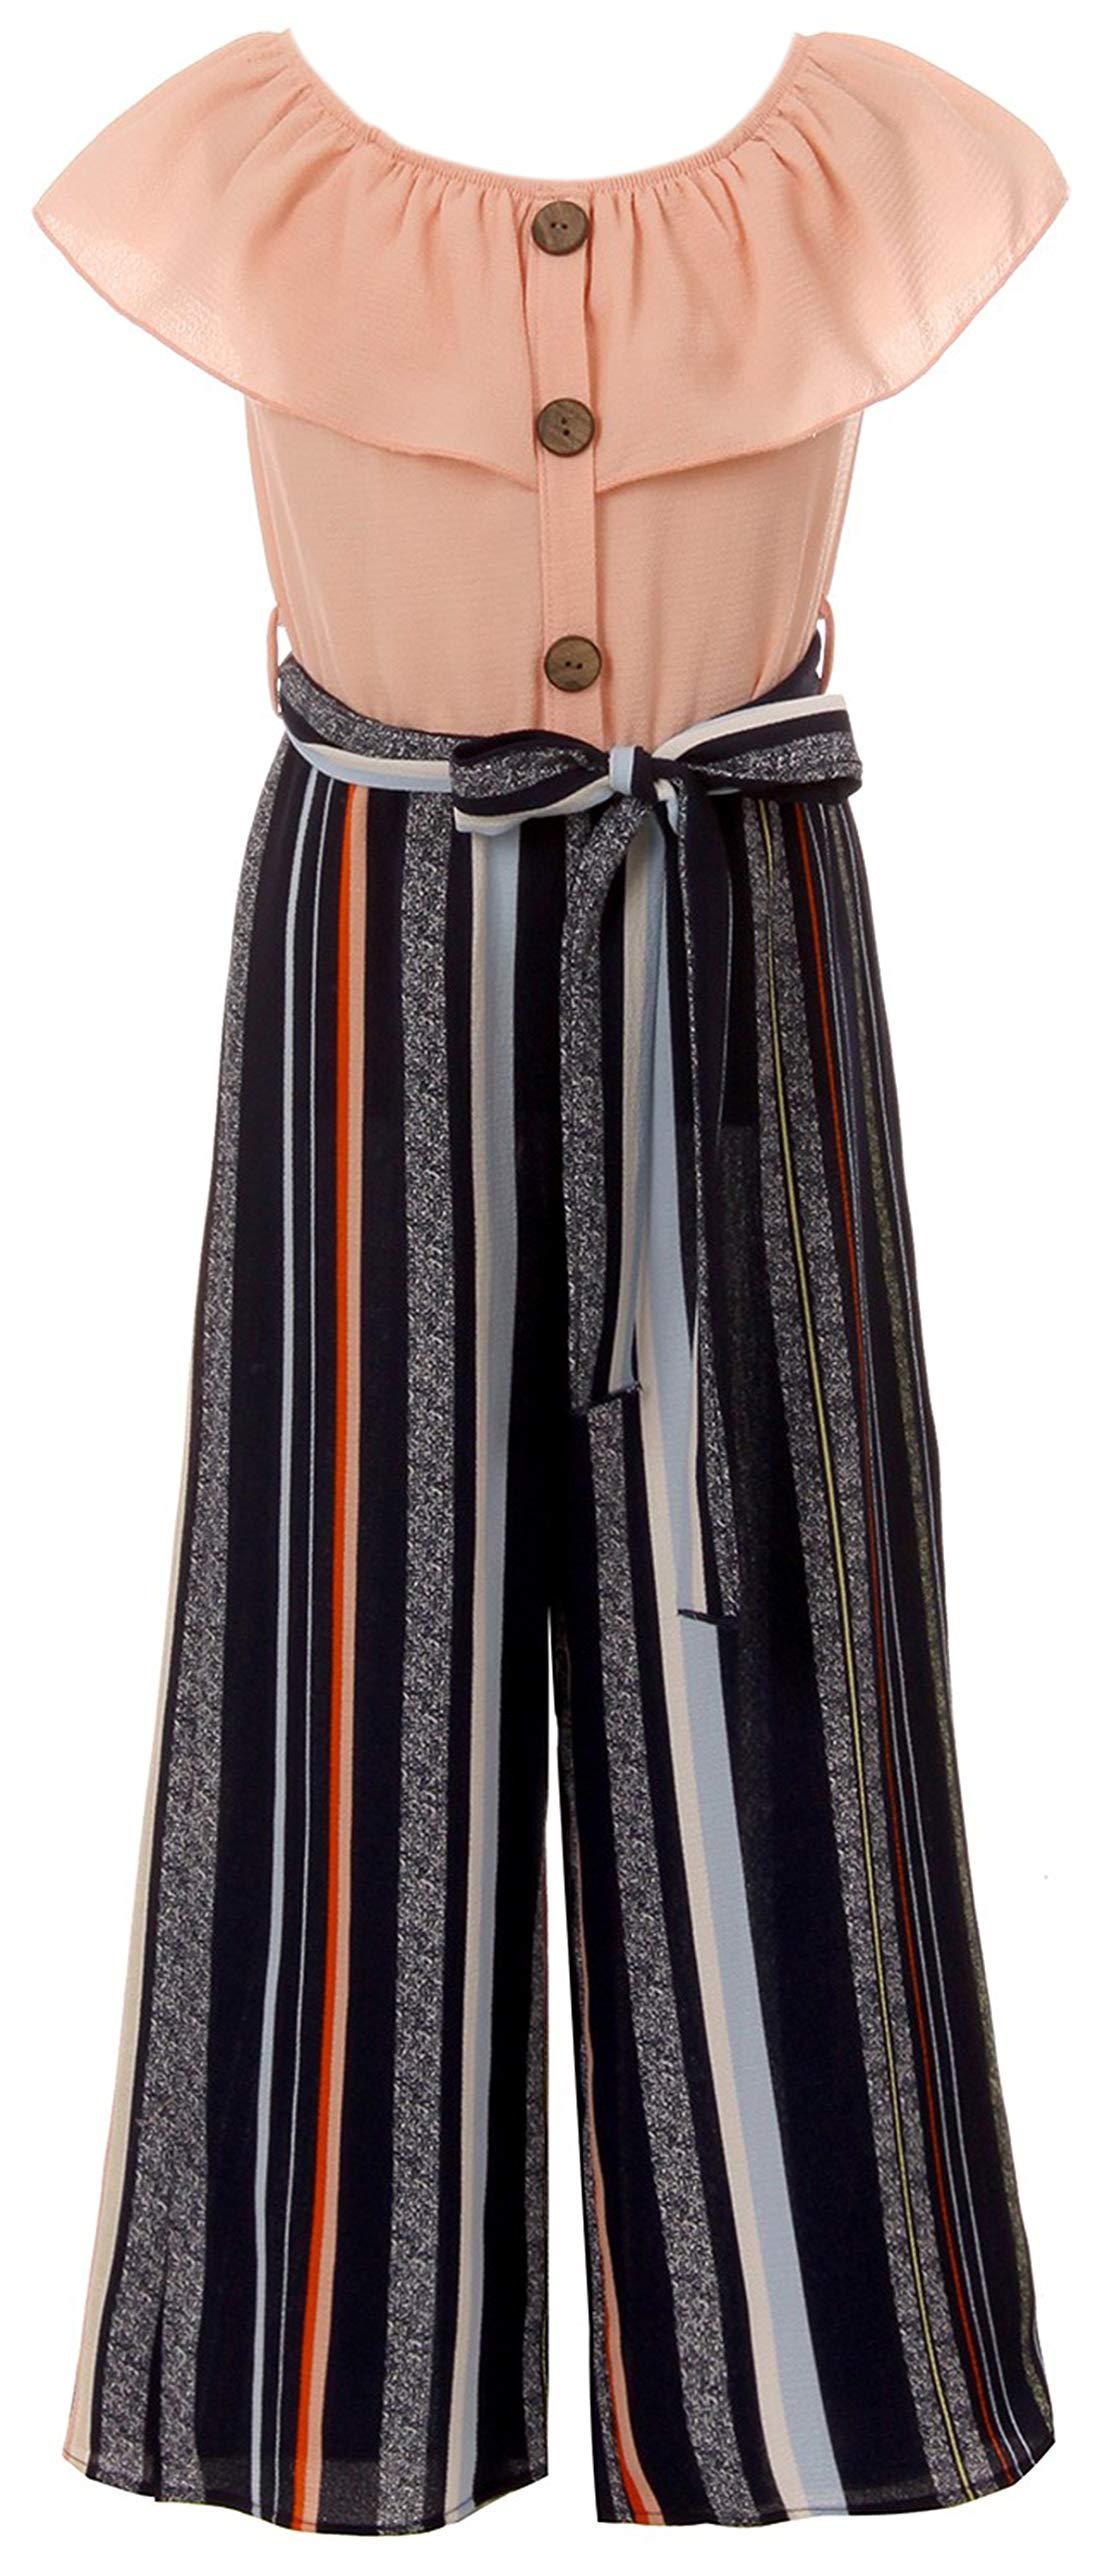 Big Girls Sleeveless Relax Fit Jumpsuit Chiffon Belt Summer Romper Jumpsuit Blush 8 (2J1K7S1) by BluNight Collection